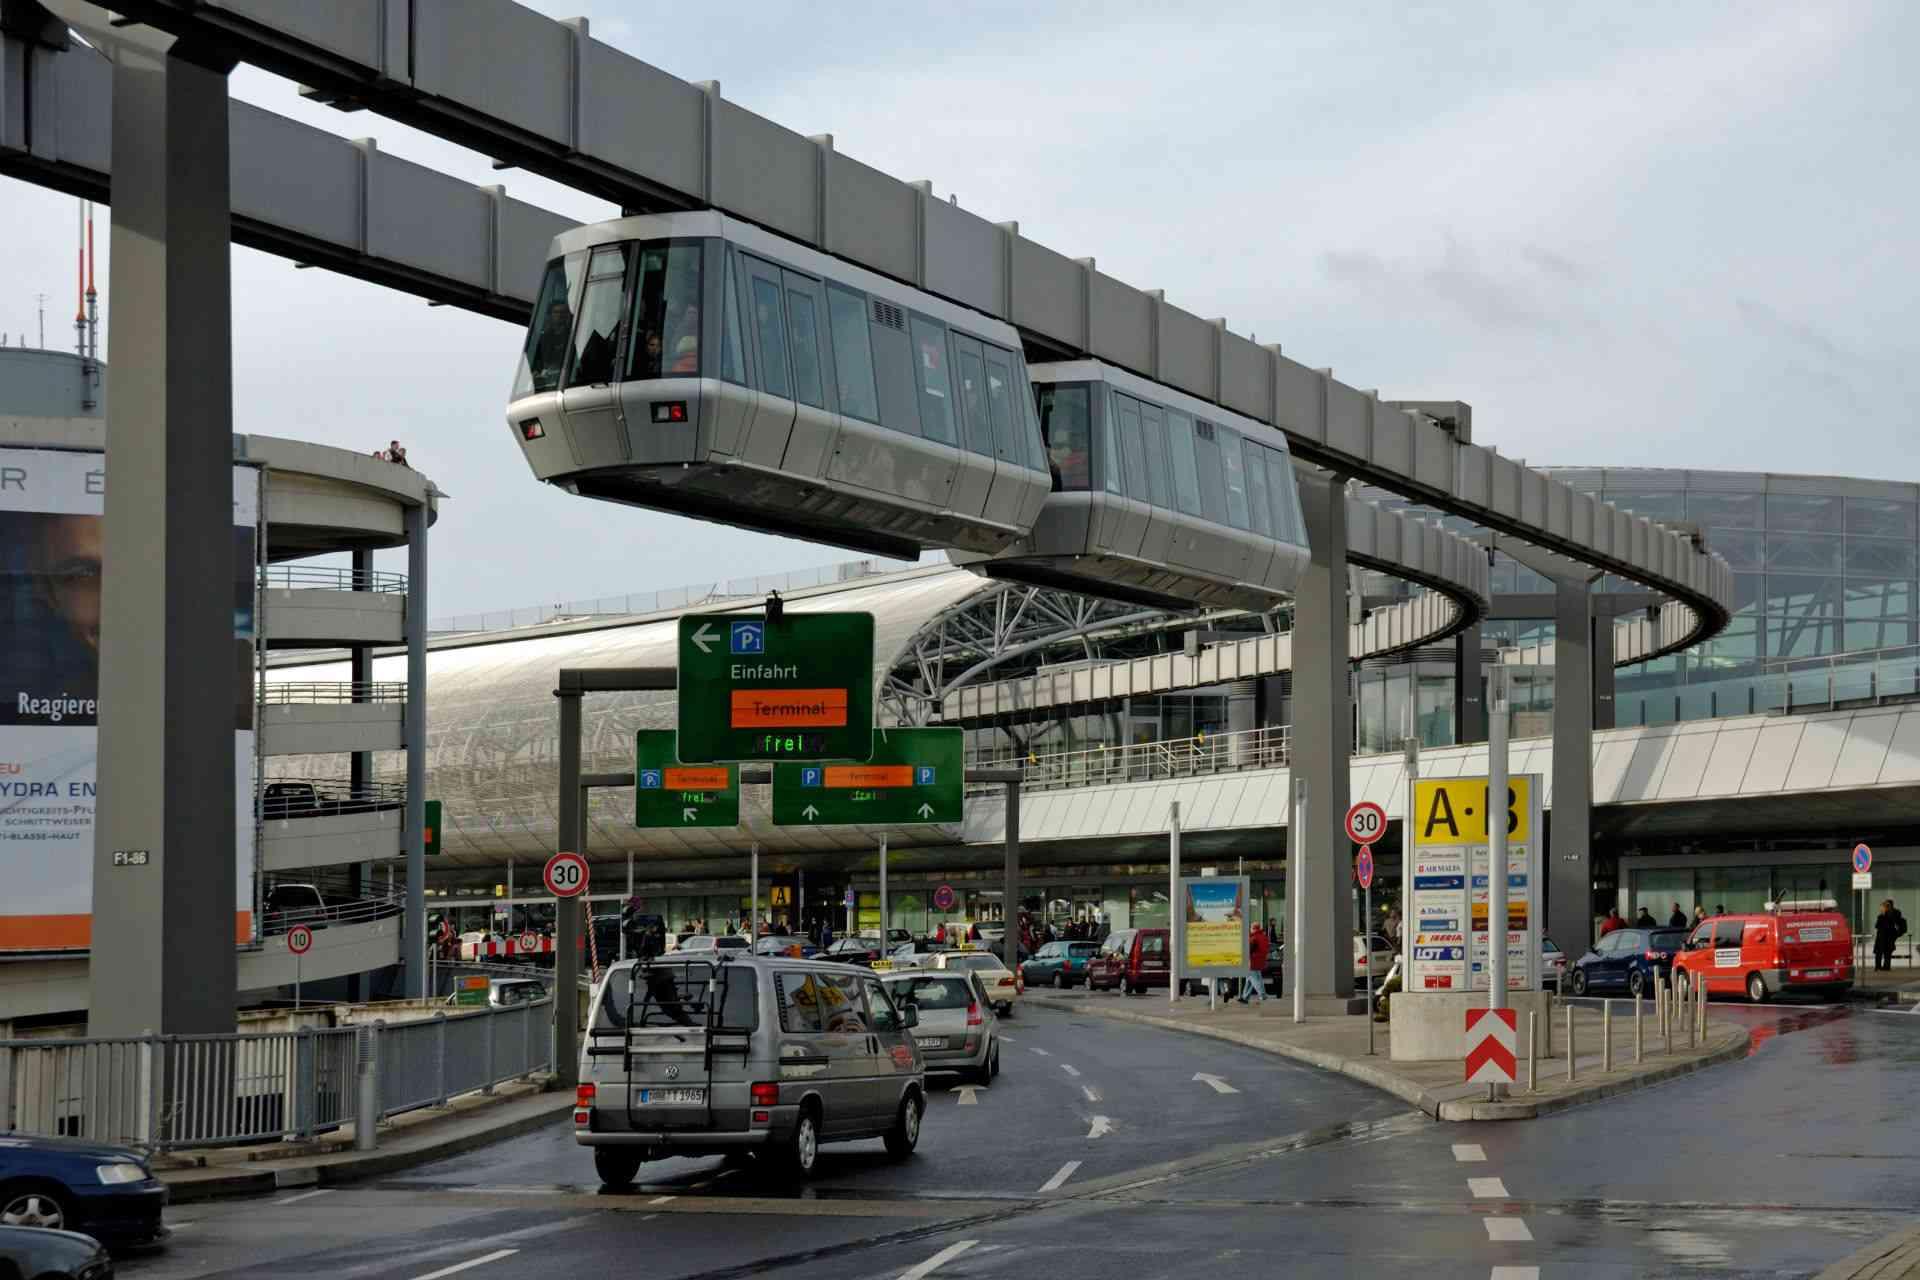 Skytrain Suspension Railway Düsseldorf Airport